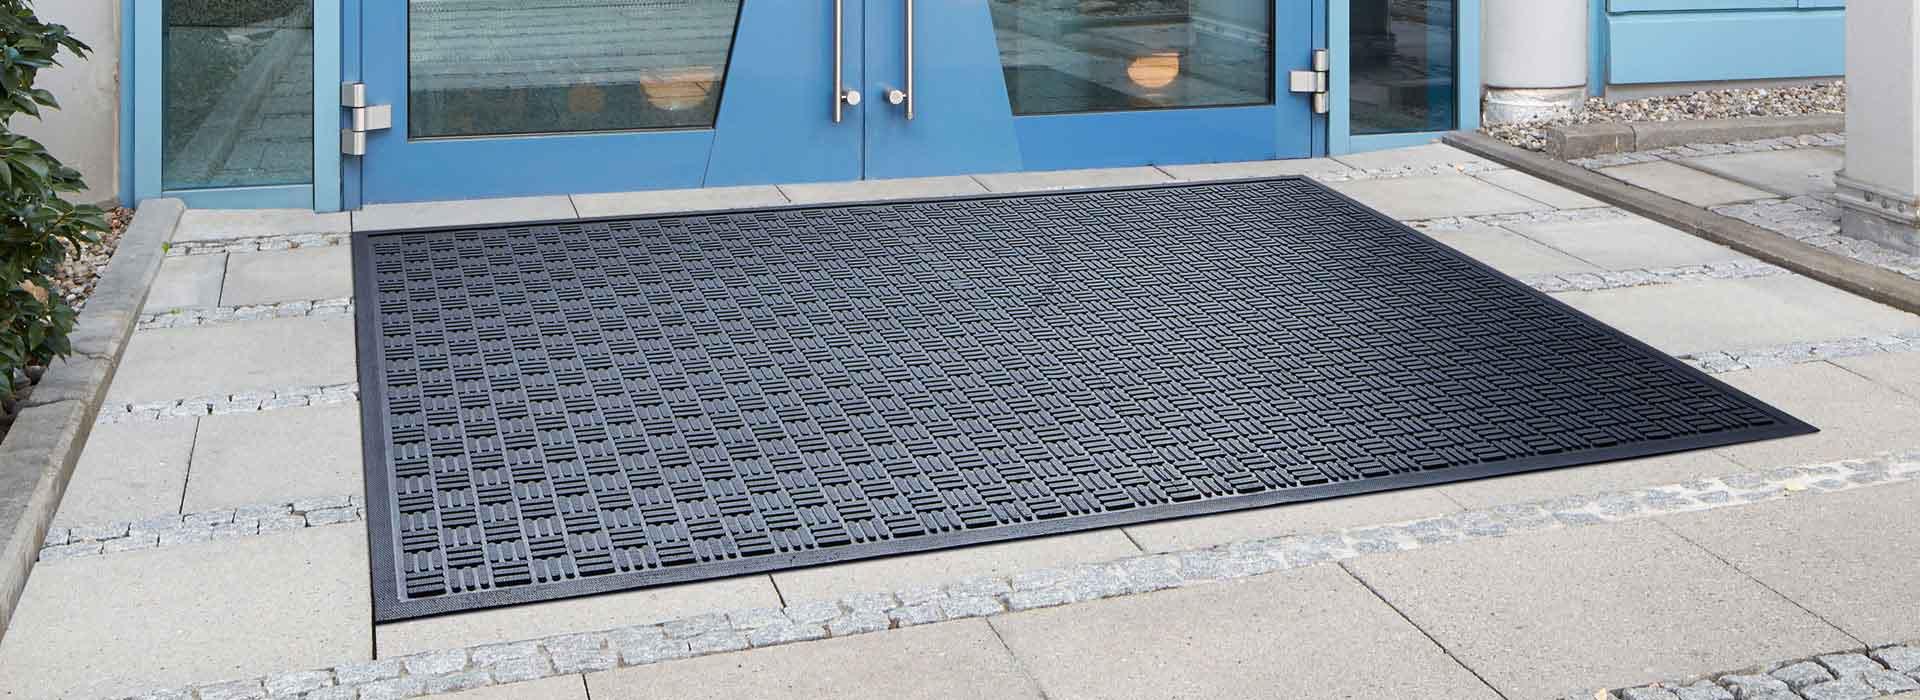 b629a180c2f8 Rubber Mats Printed Carpet Safety Matting PVC Tiles Gym Mats